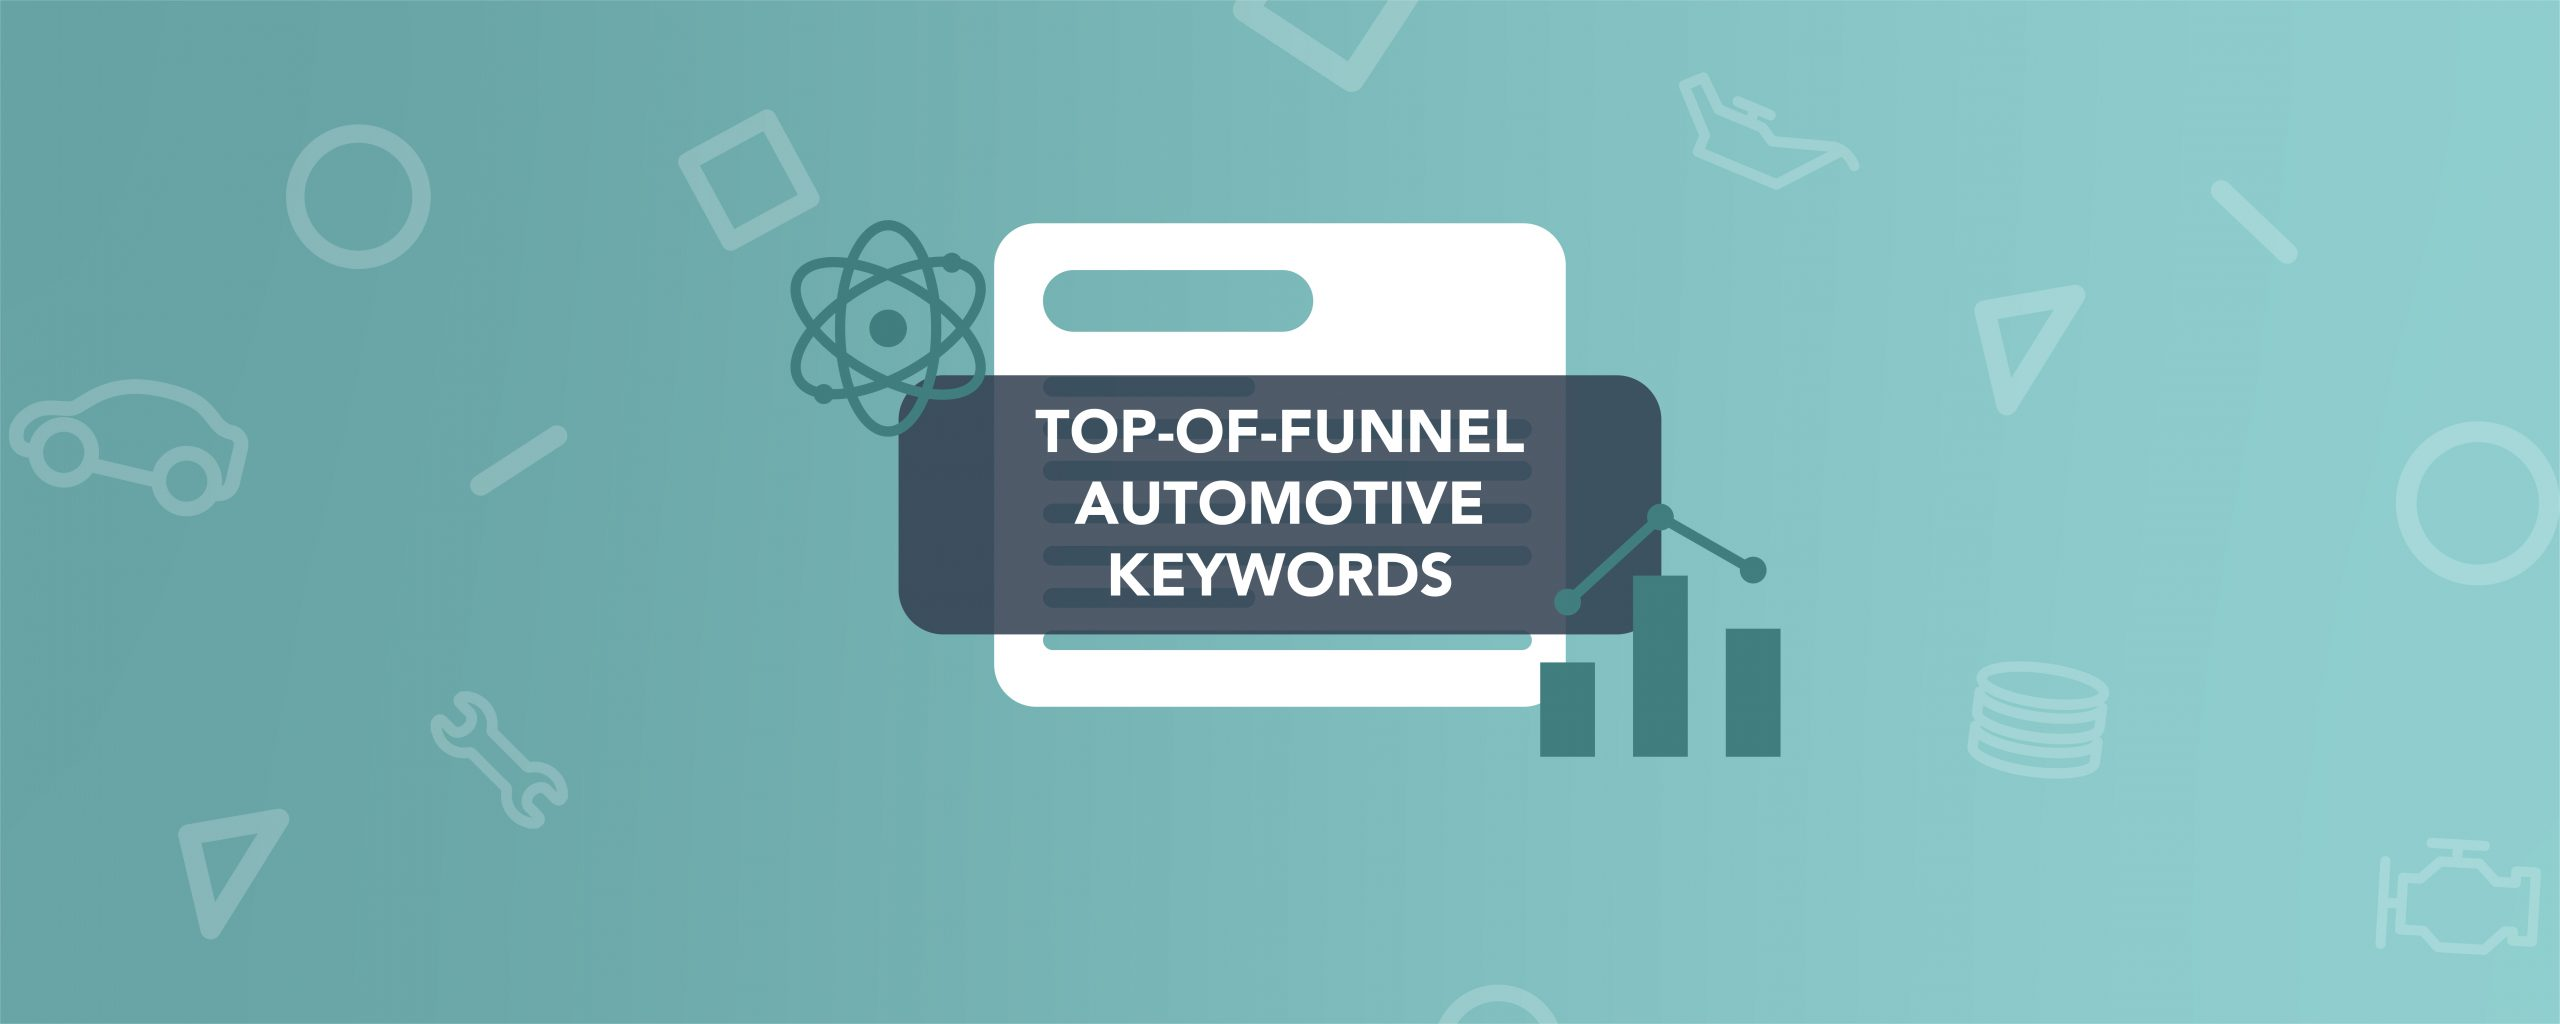 Top-of-Funnel Automotive Keywords banner